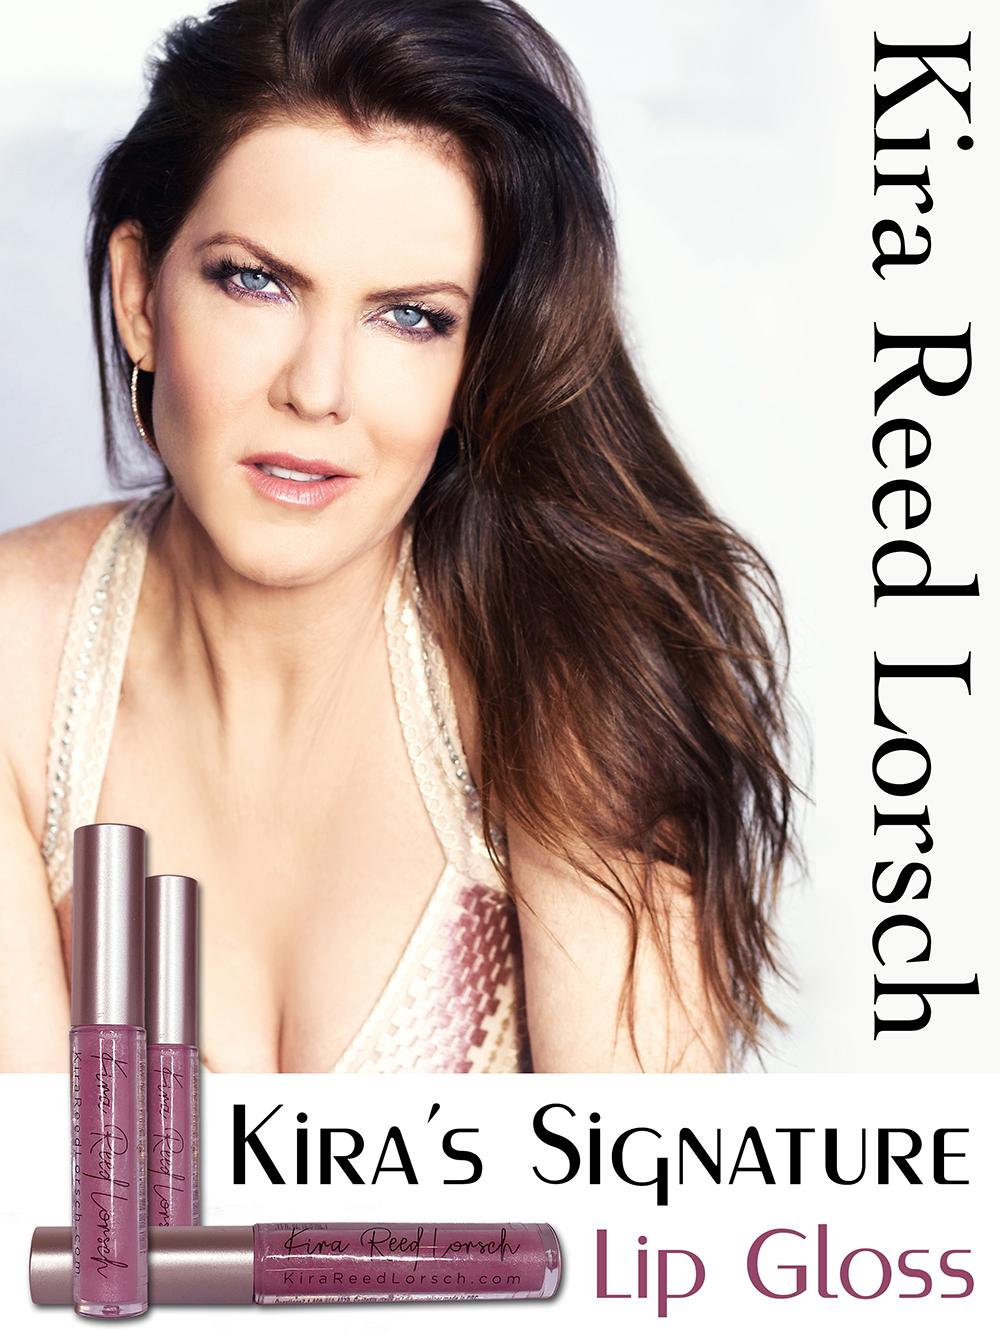 Kira Reed Lorsch - Kira's Signature Lip Gloss